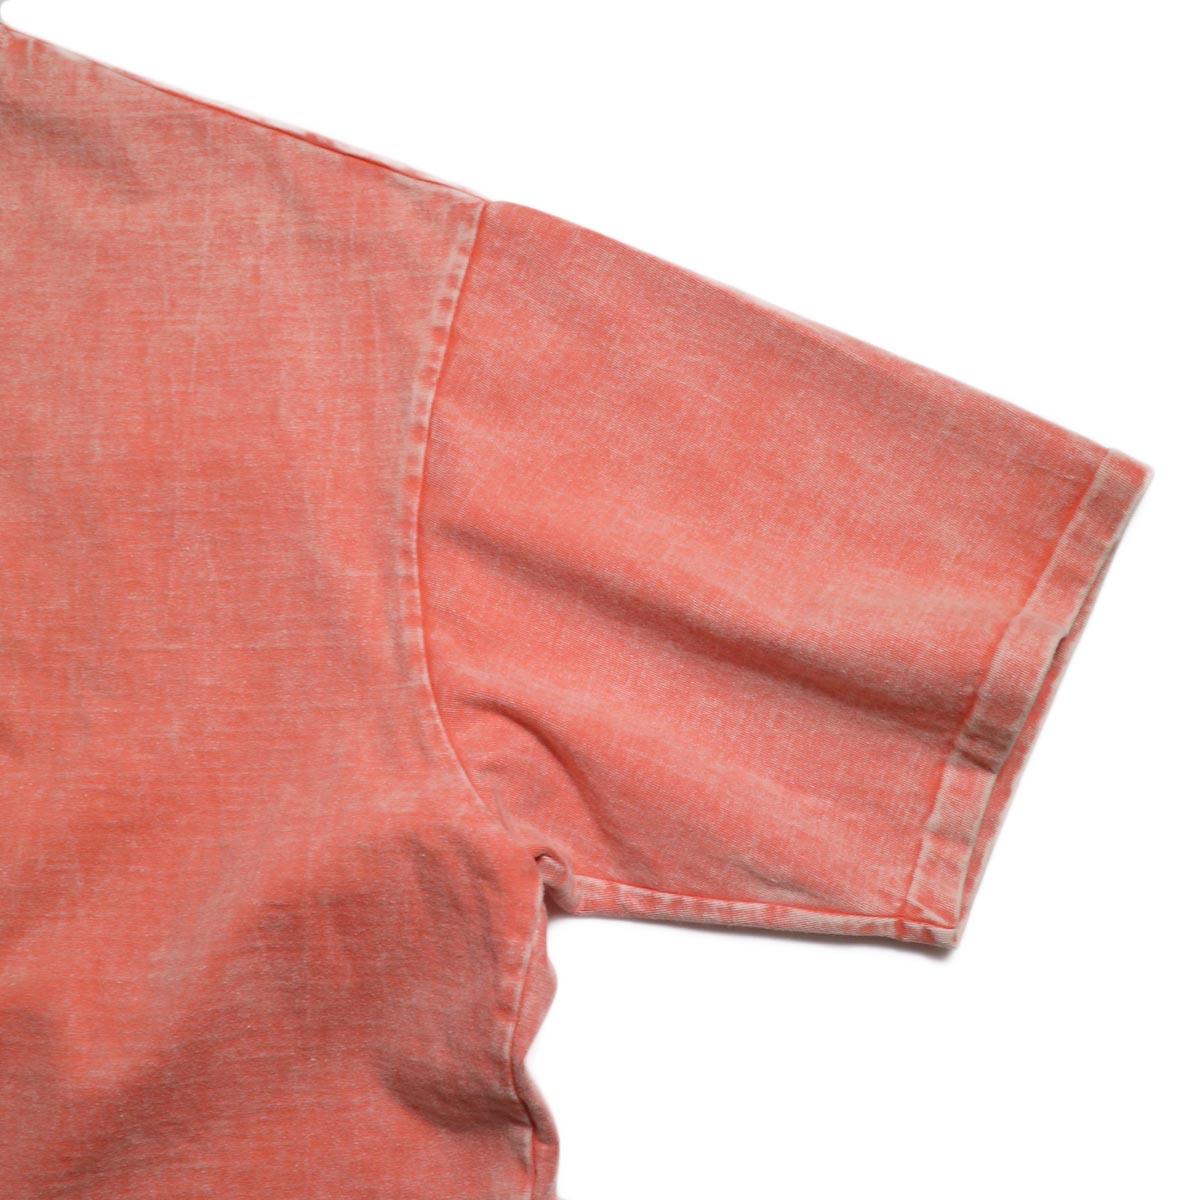 N.HOOLYWOOD × Gramicci  / 191-CS27-024 Short Sleeve Tee -Pink 袖